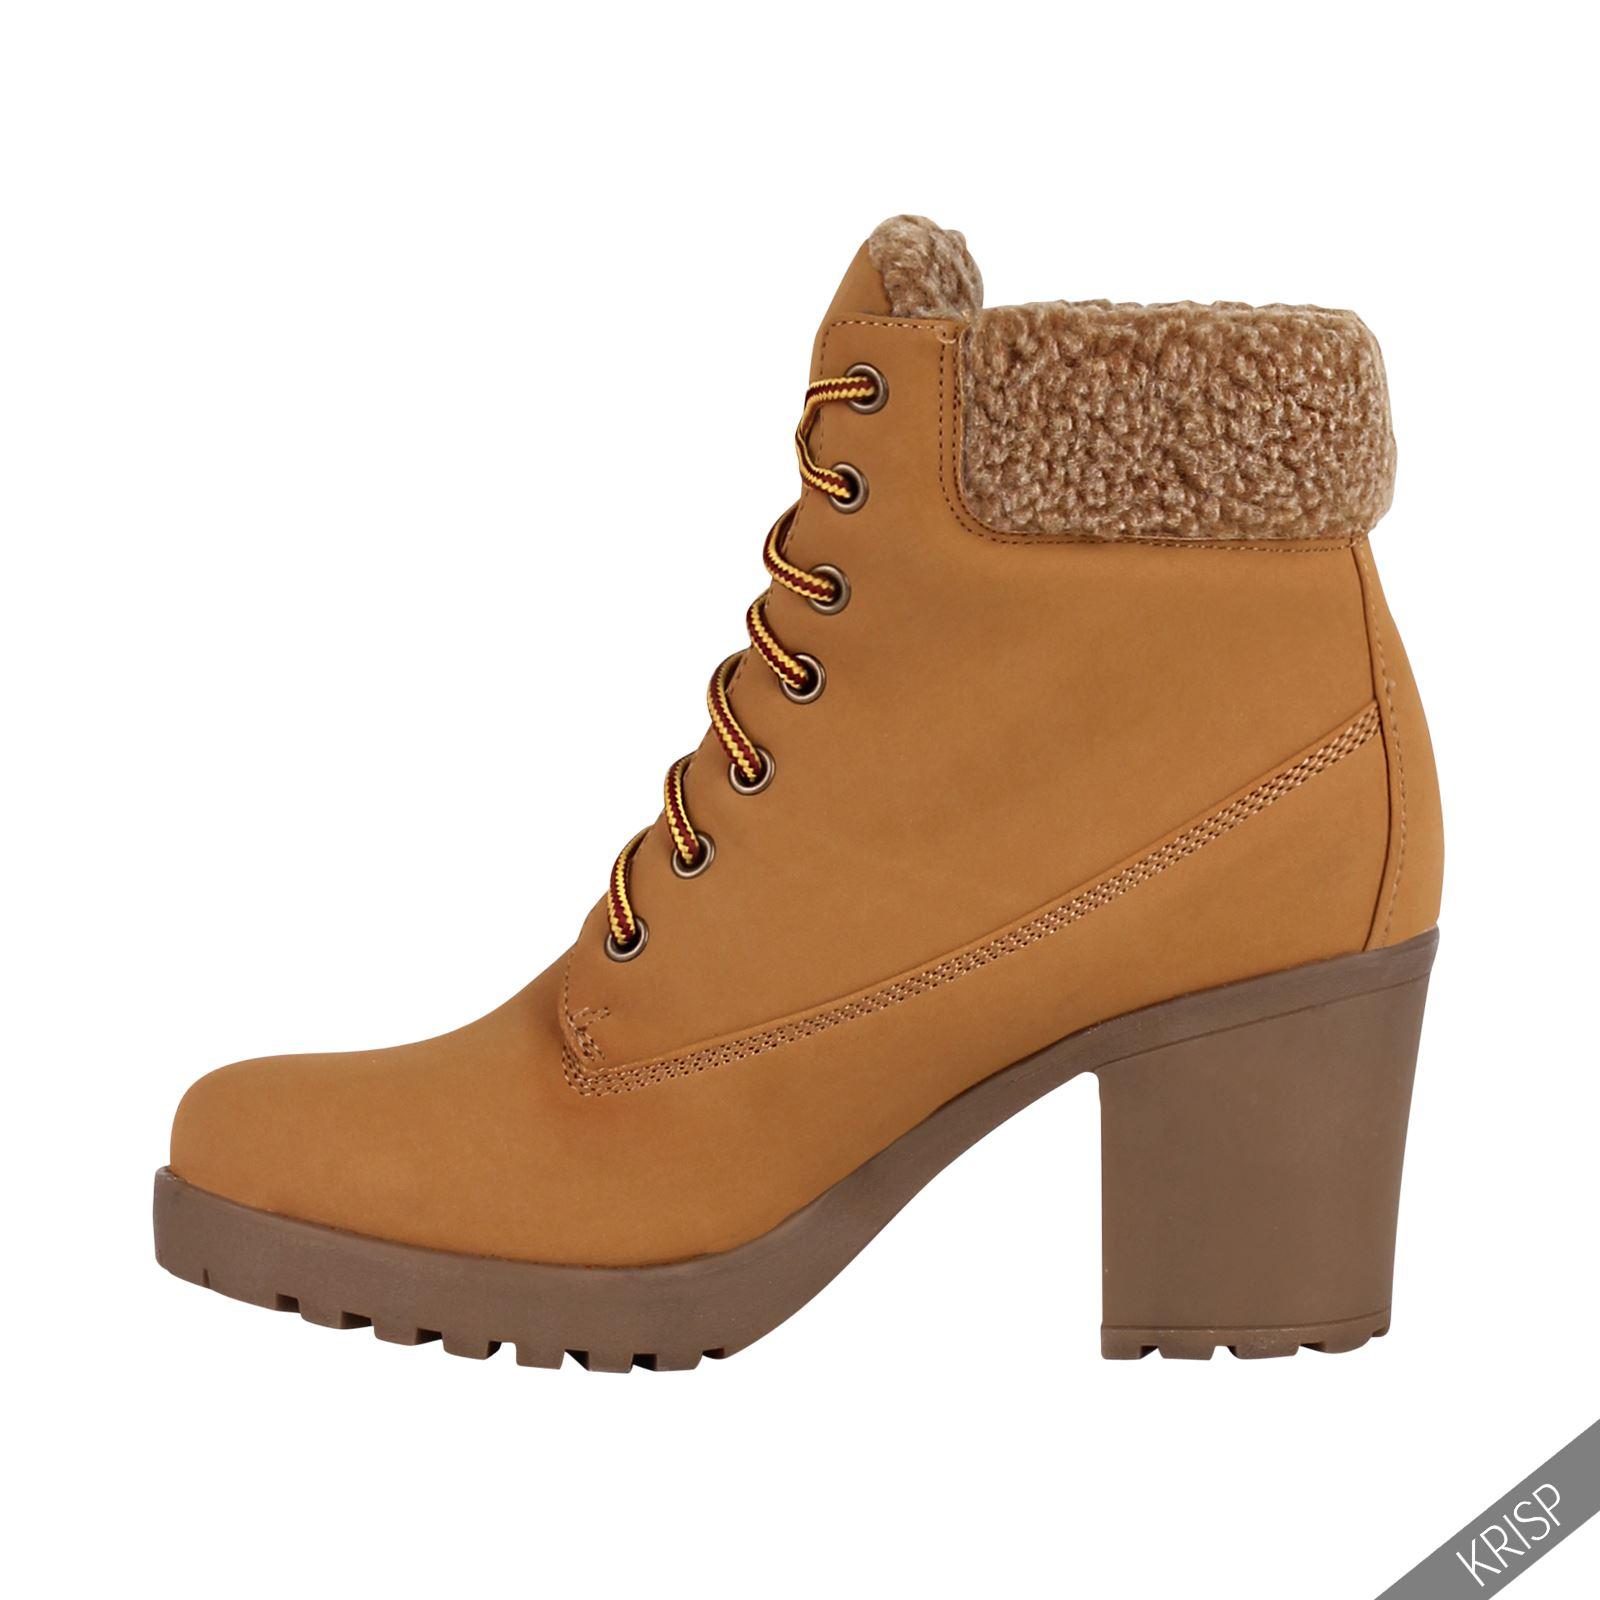 Botines-Mujer-Camel-Bota-Plana-Suela-Goma-Cordones-Casual-Otono-Invierno-Tacon miniatura 25